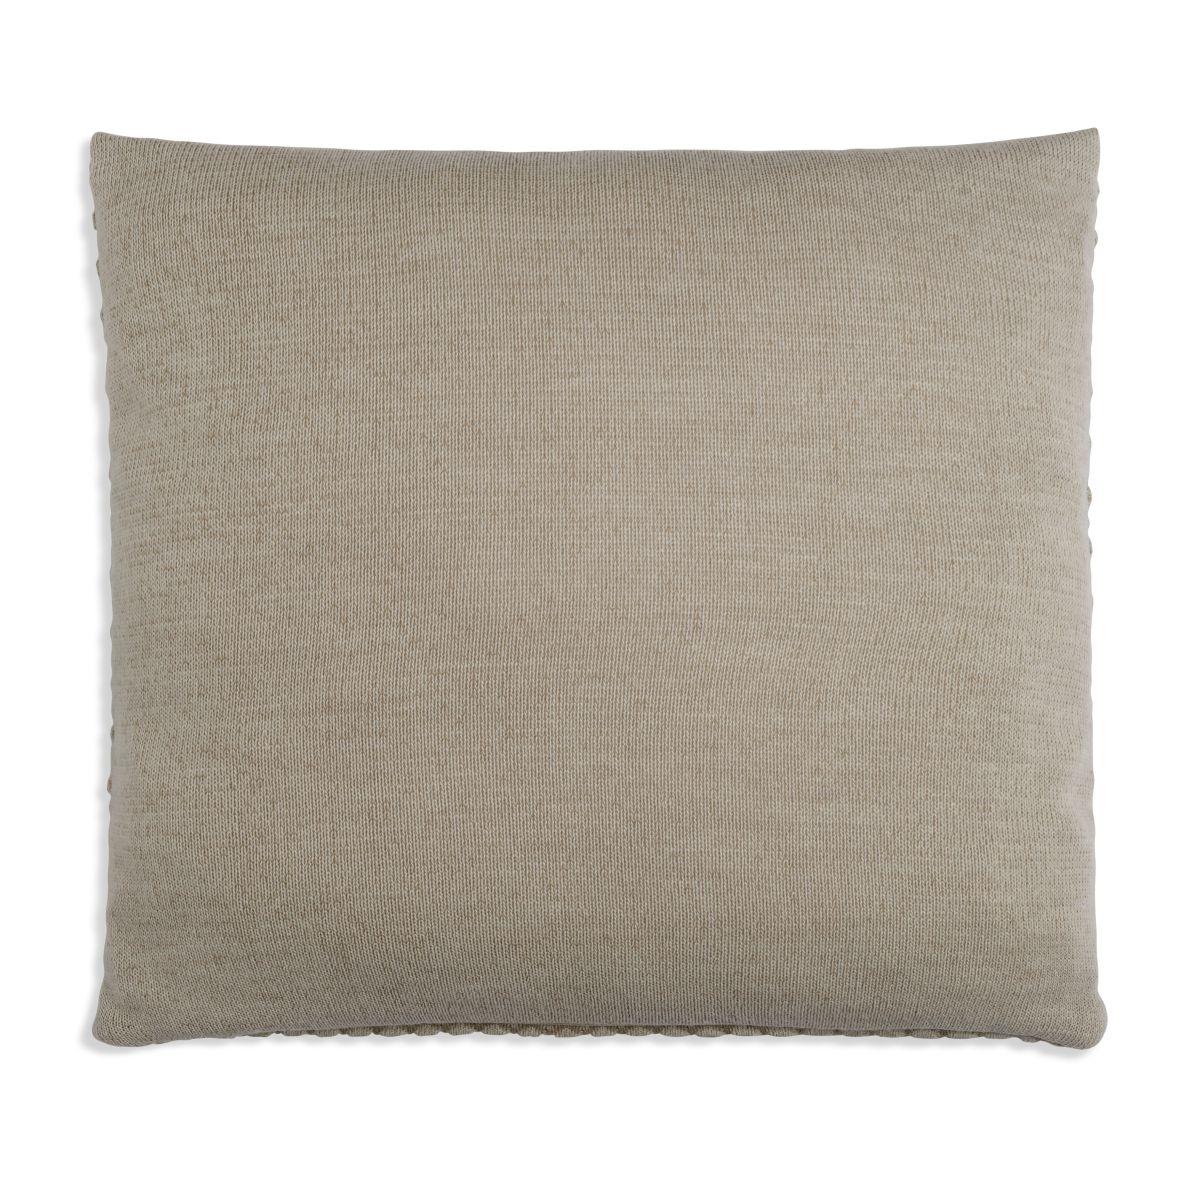 knit factory 1241257 kussen 50x50 juul seda olive 2